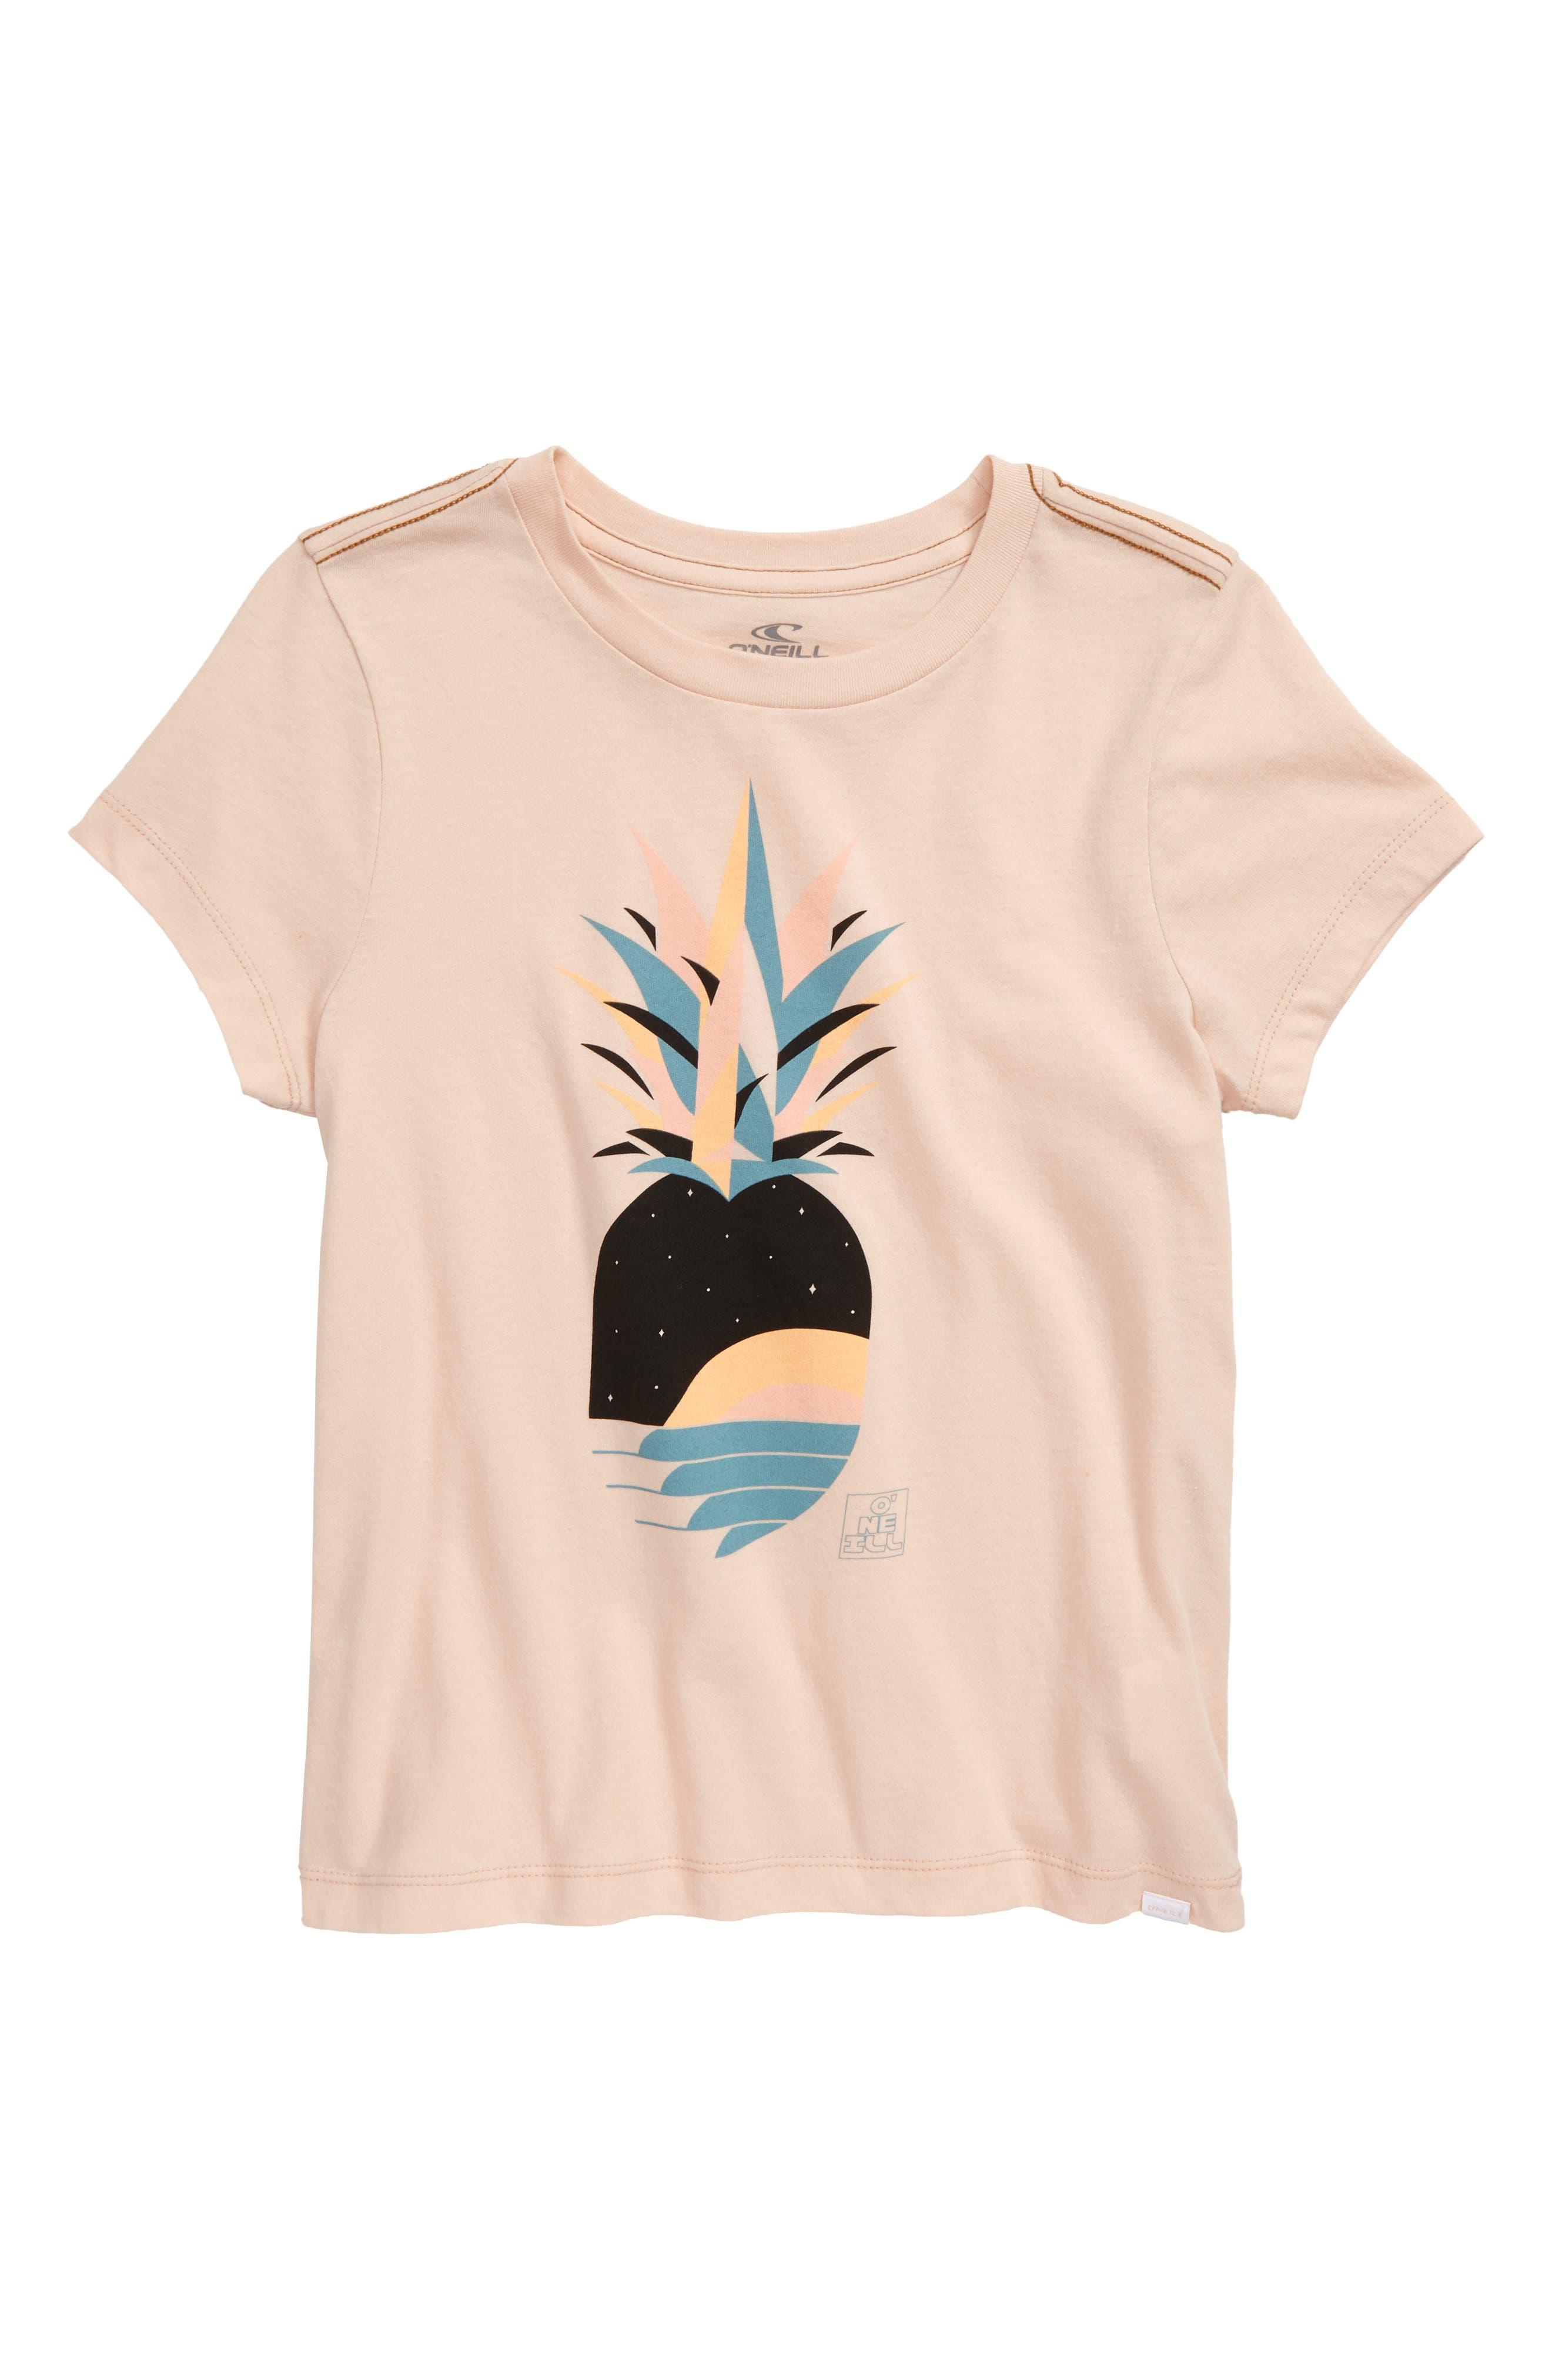 Girls ONeill Galaxy Pineapple Print Tee Size M (810)  Pink